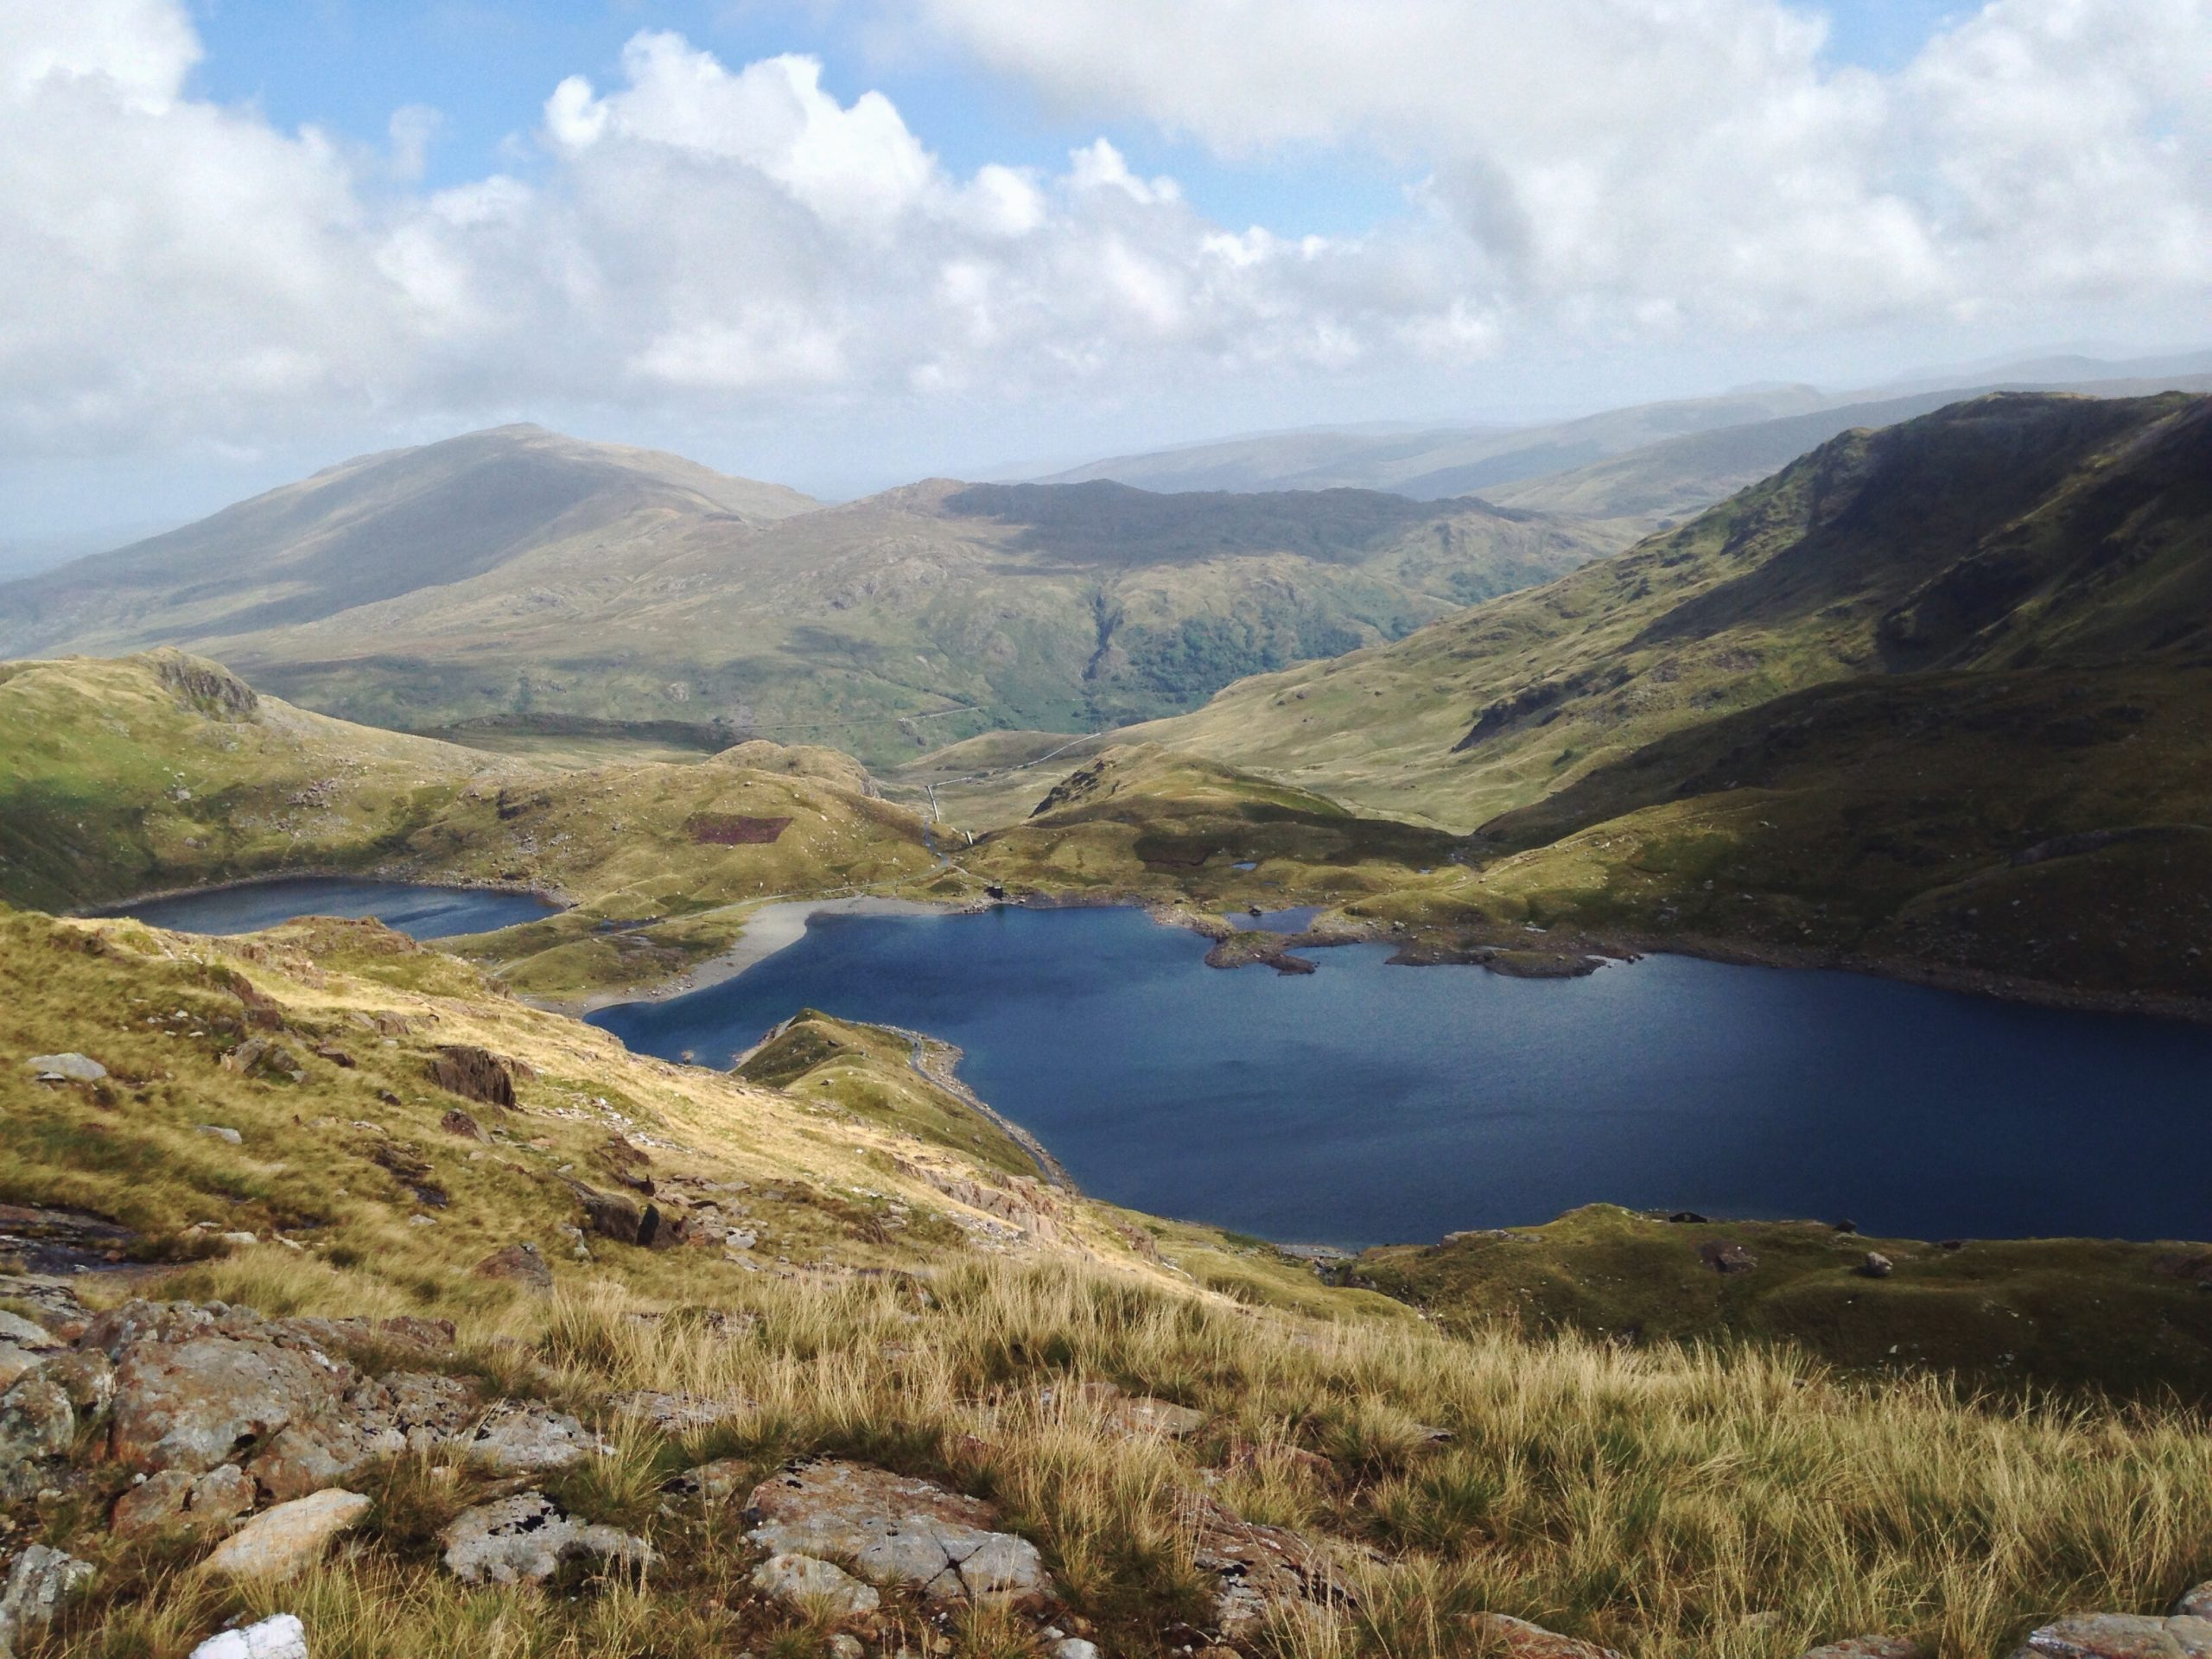 That Adventure in Snowdonia